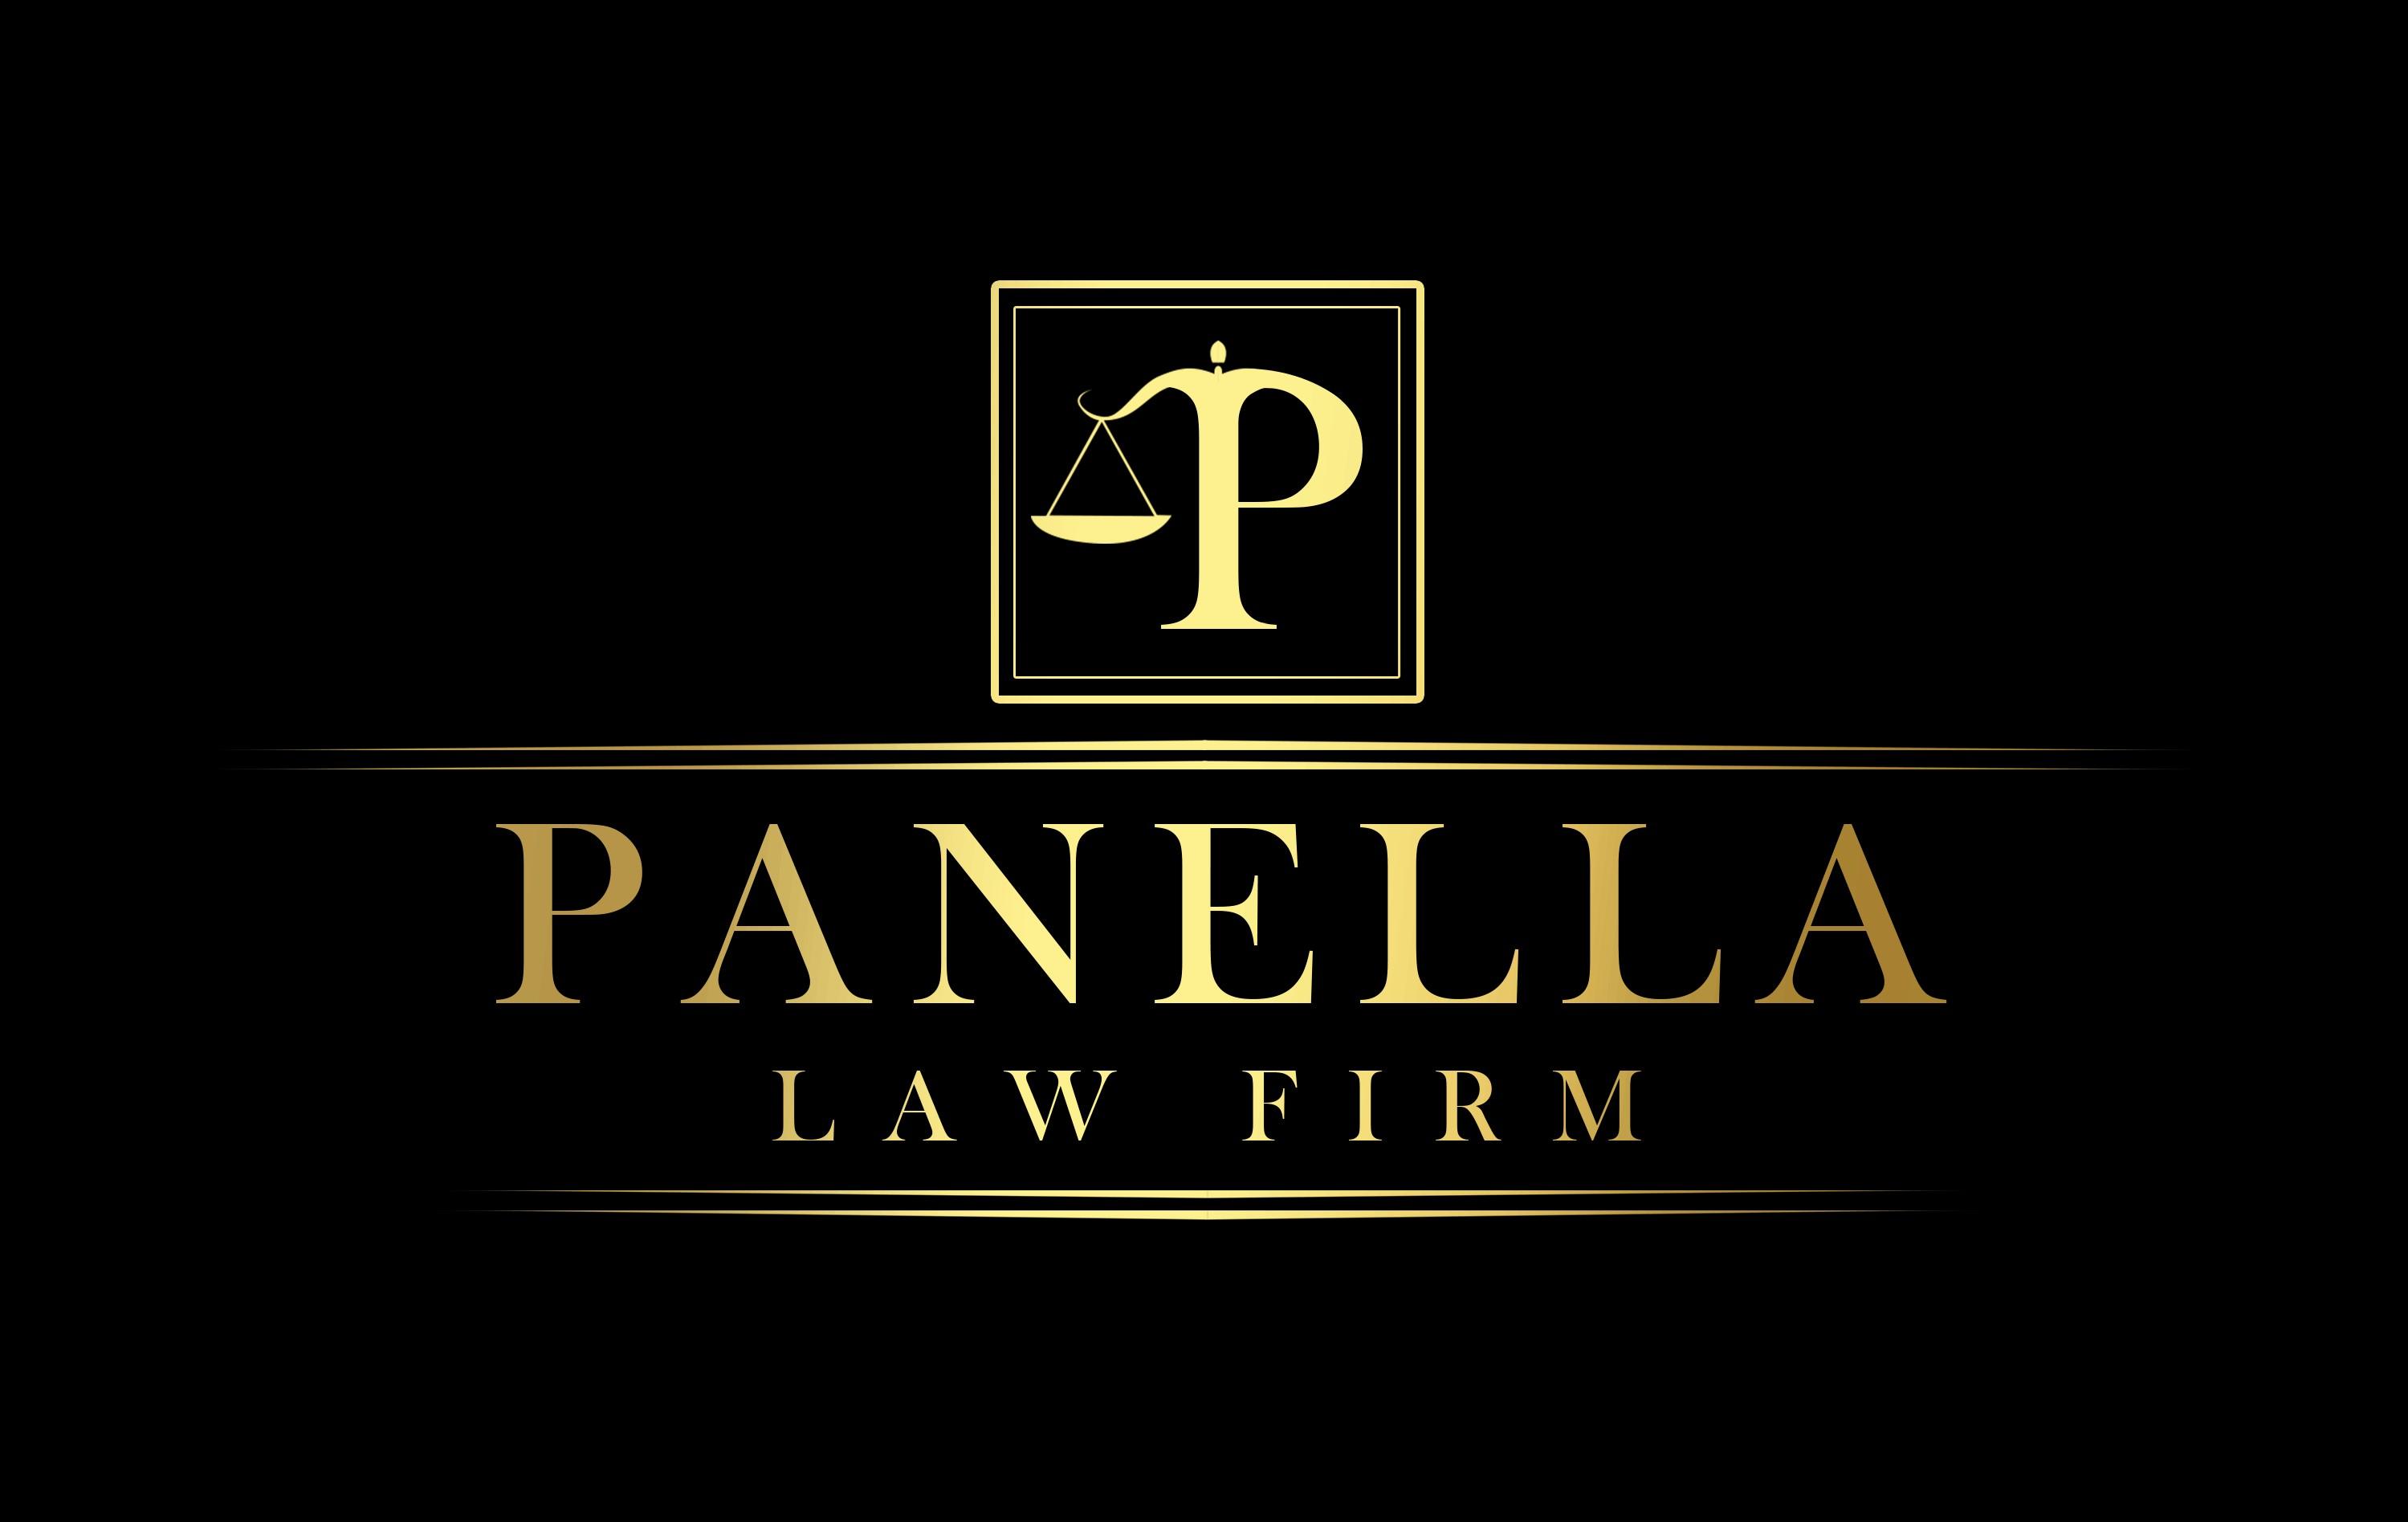 Panella Law Firm